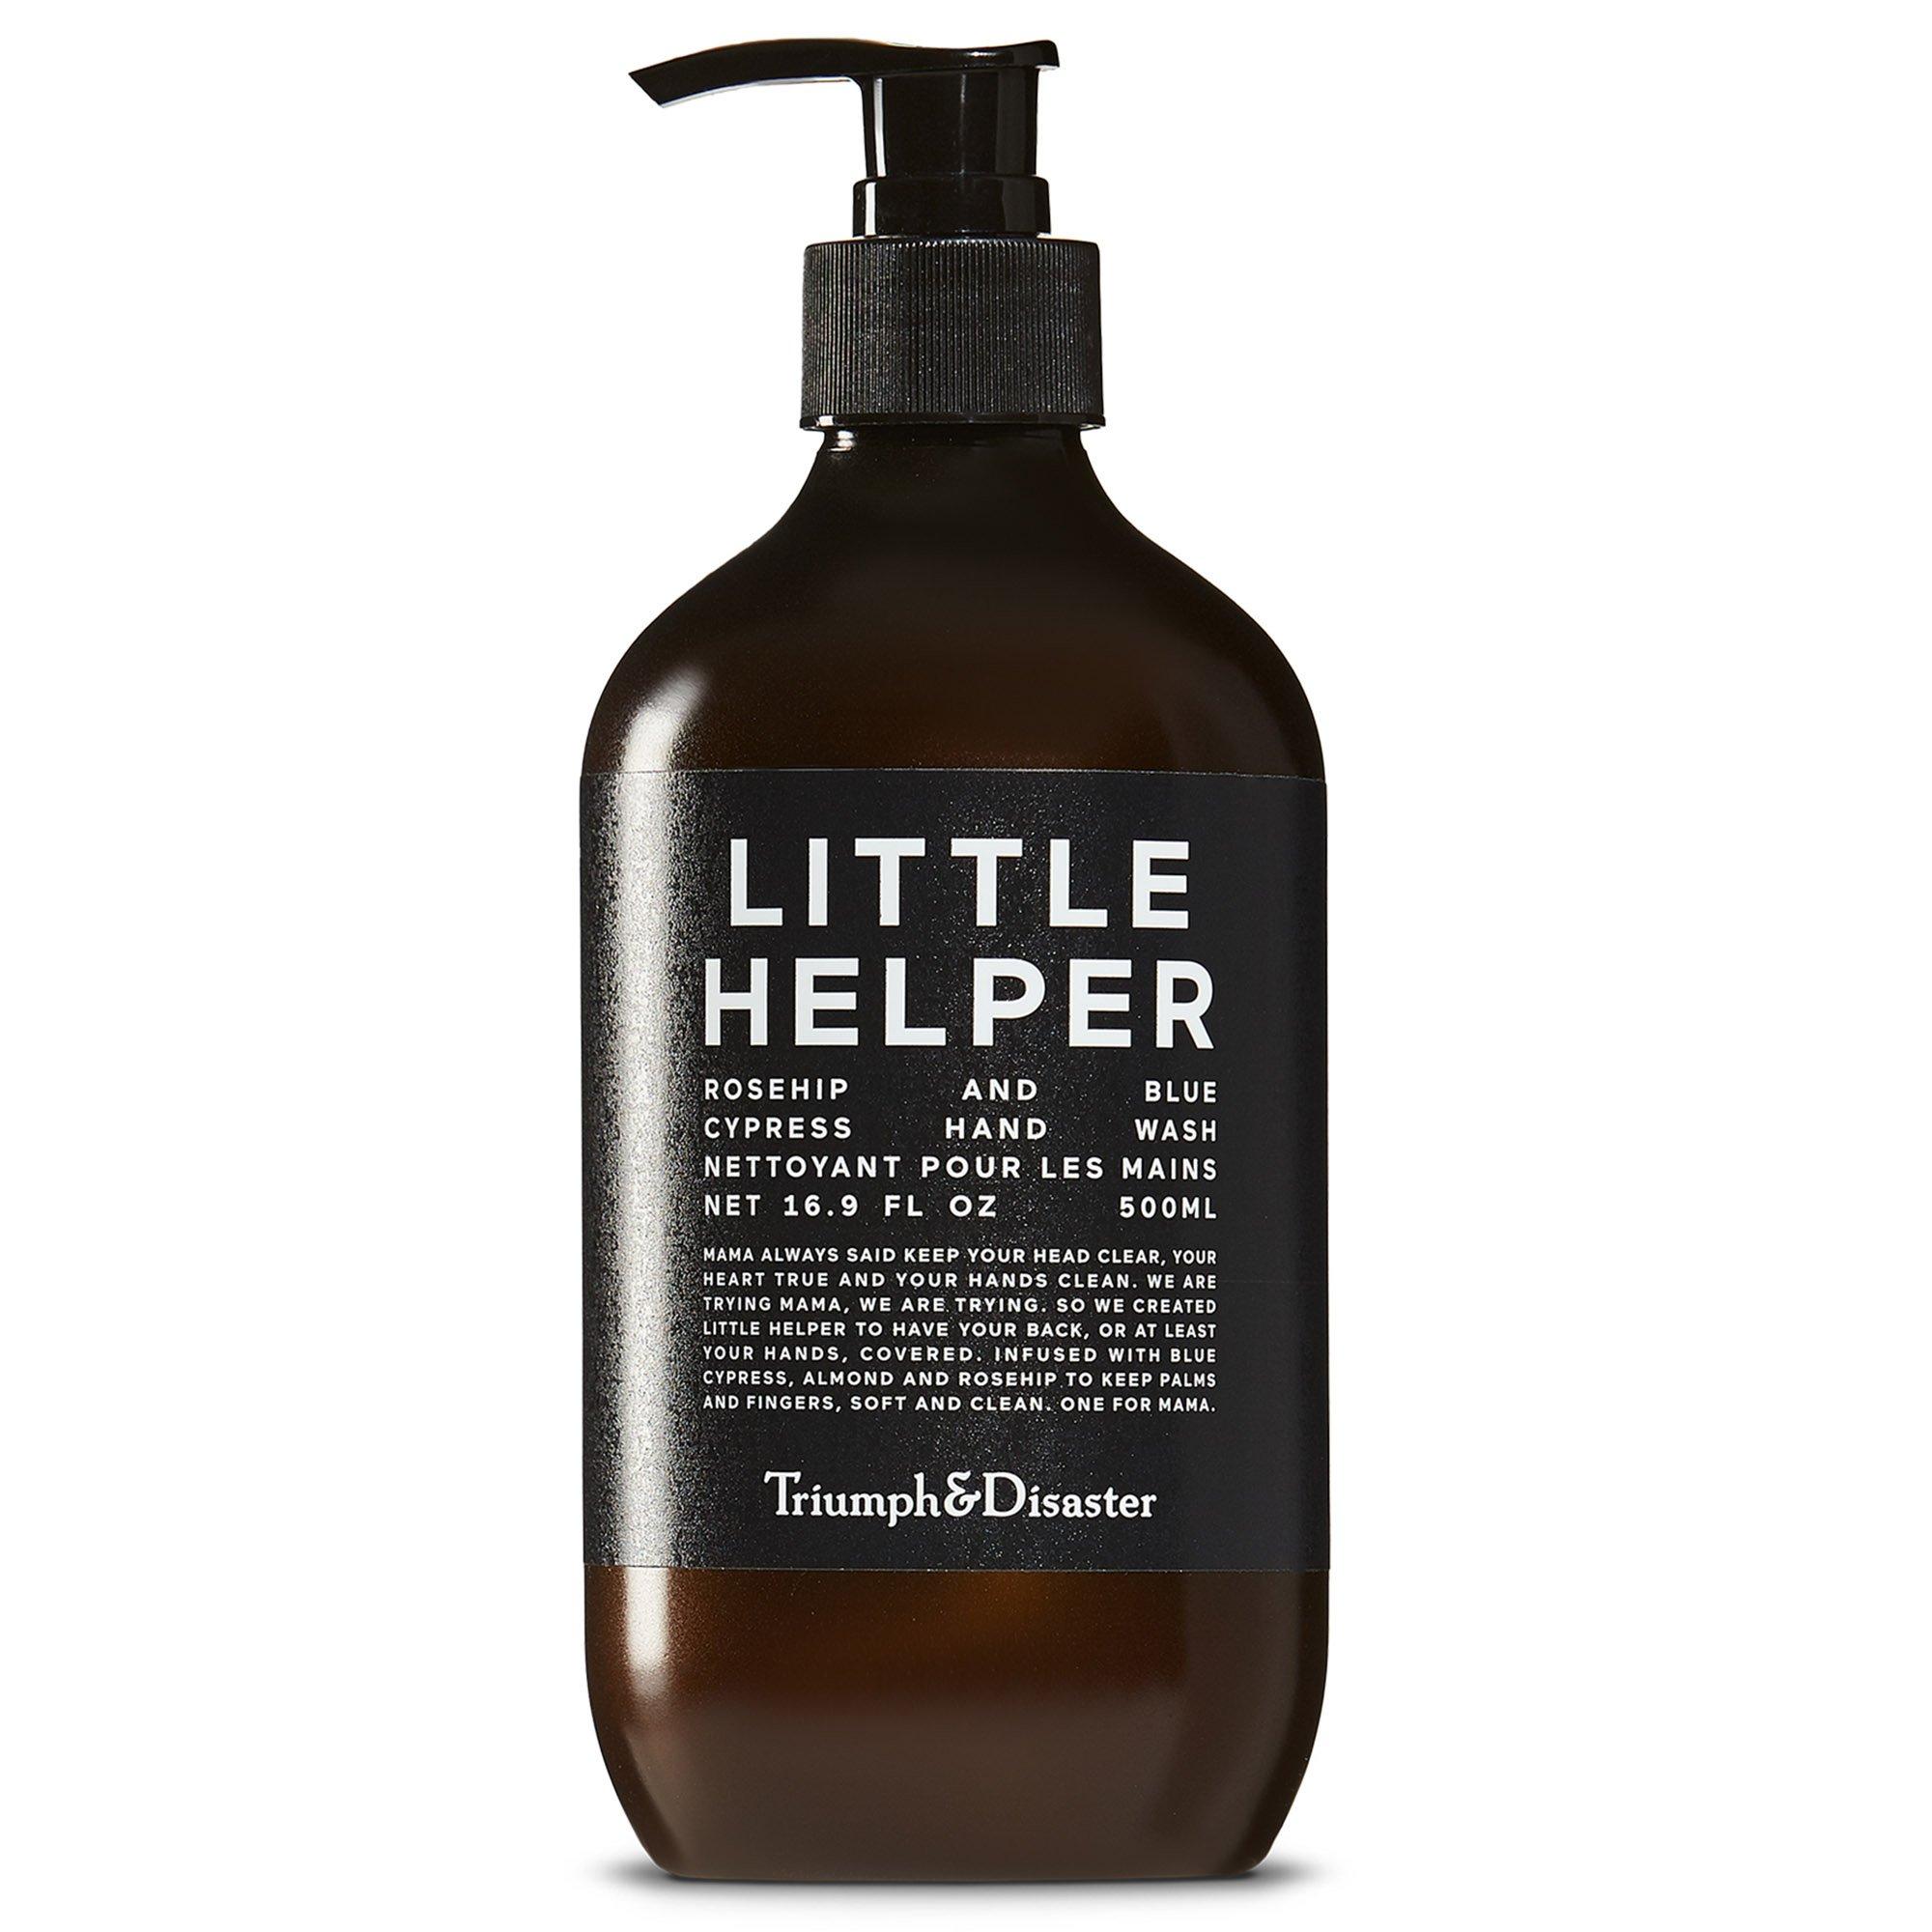 Triumph & Disaster Little Helper Hand Wash 500ml – Rosehip & Blue Cypress Natural SLS/SLES-free Plant-Based Gentle Skin Rejuvenating Handwash